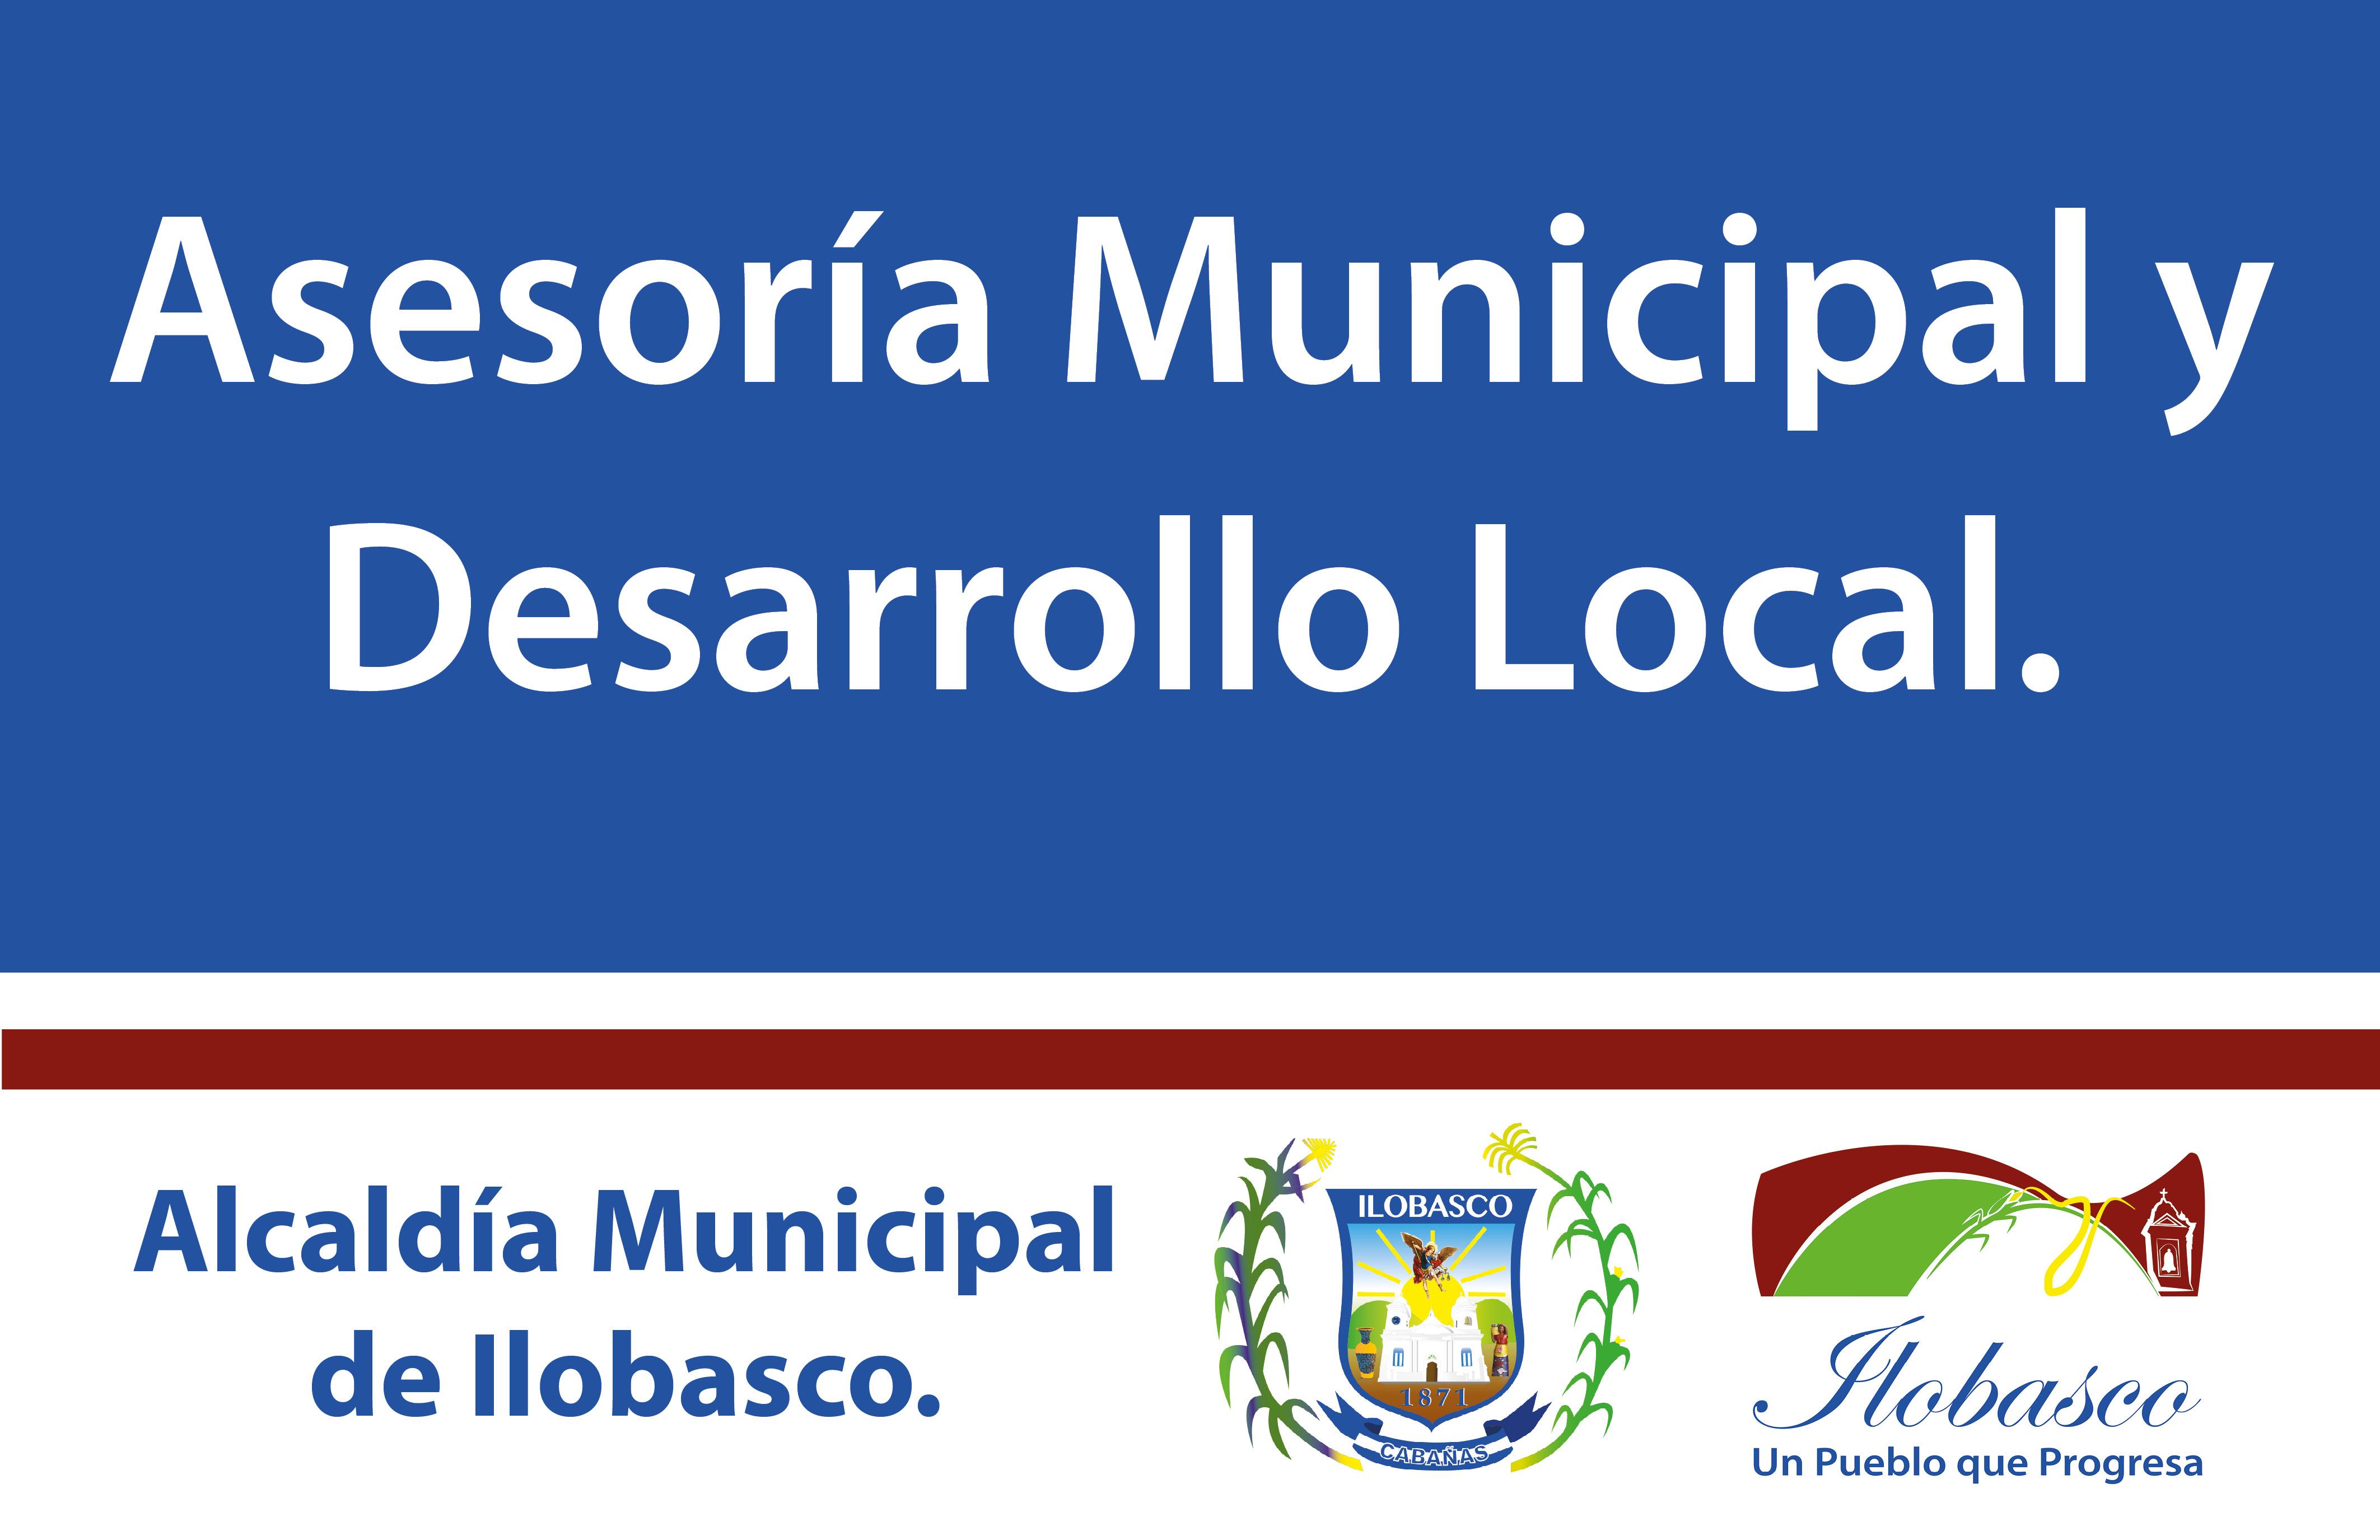 asesoria-municipal-ilobasco